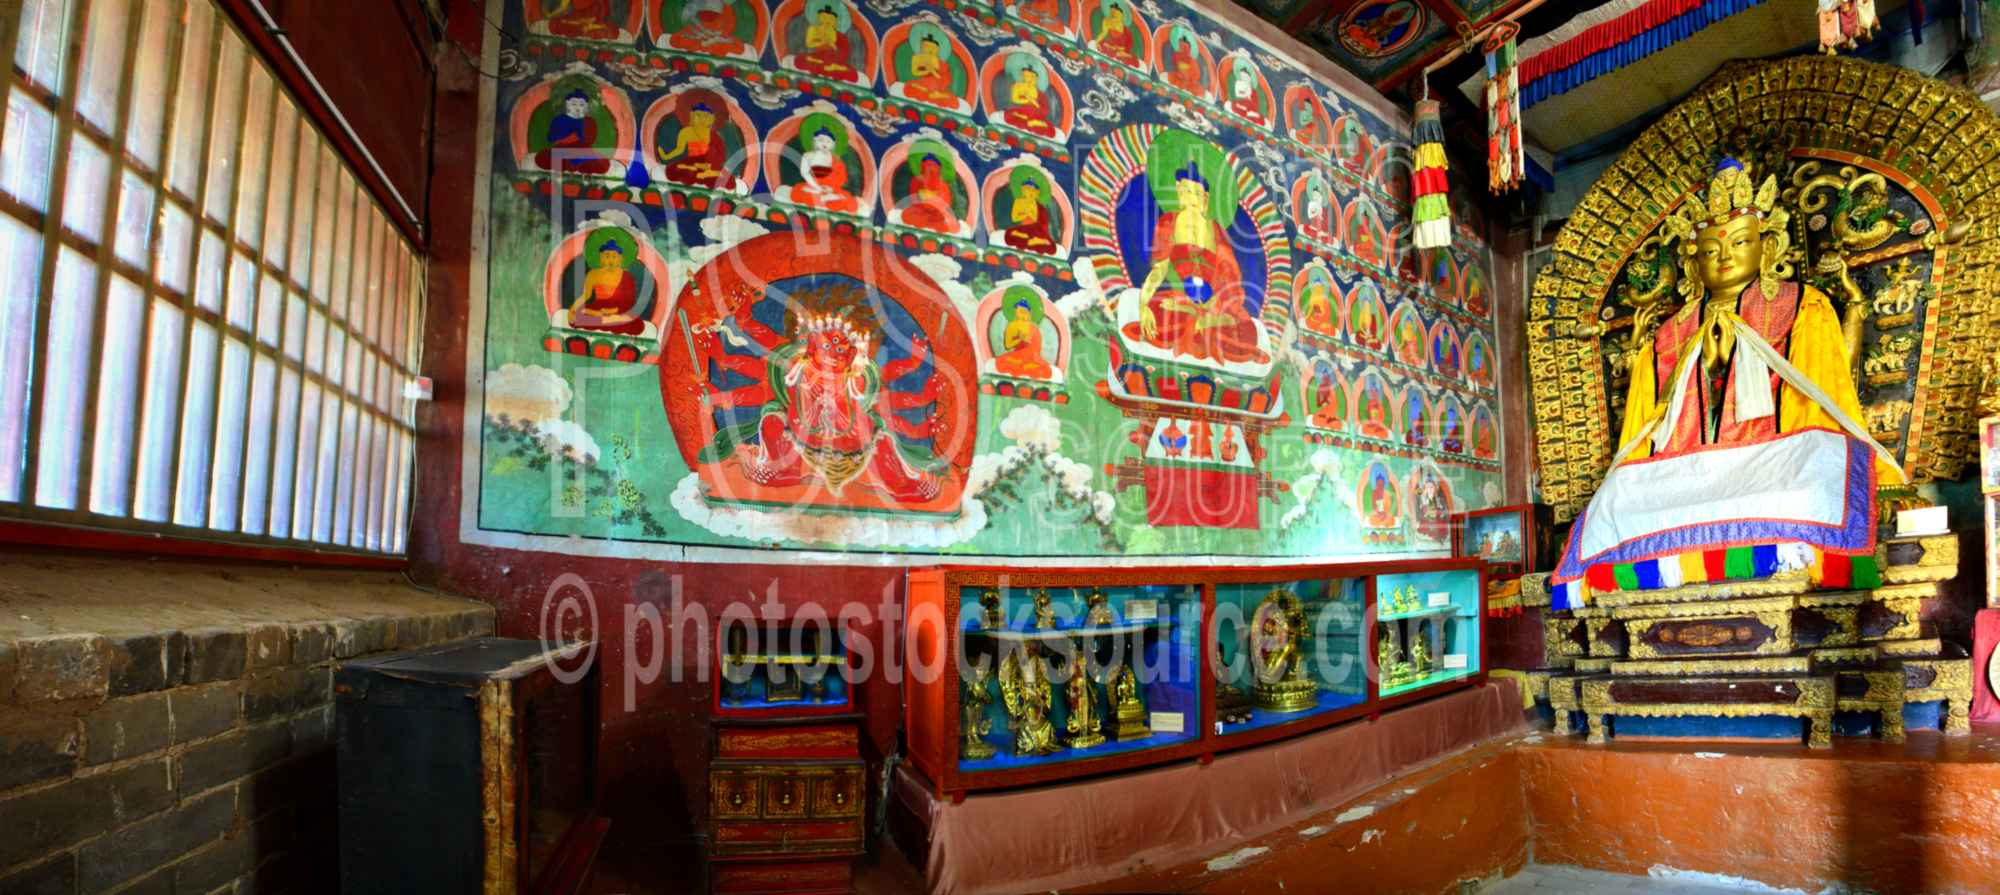 Erdene Zuu Temple Wall Mural